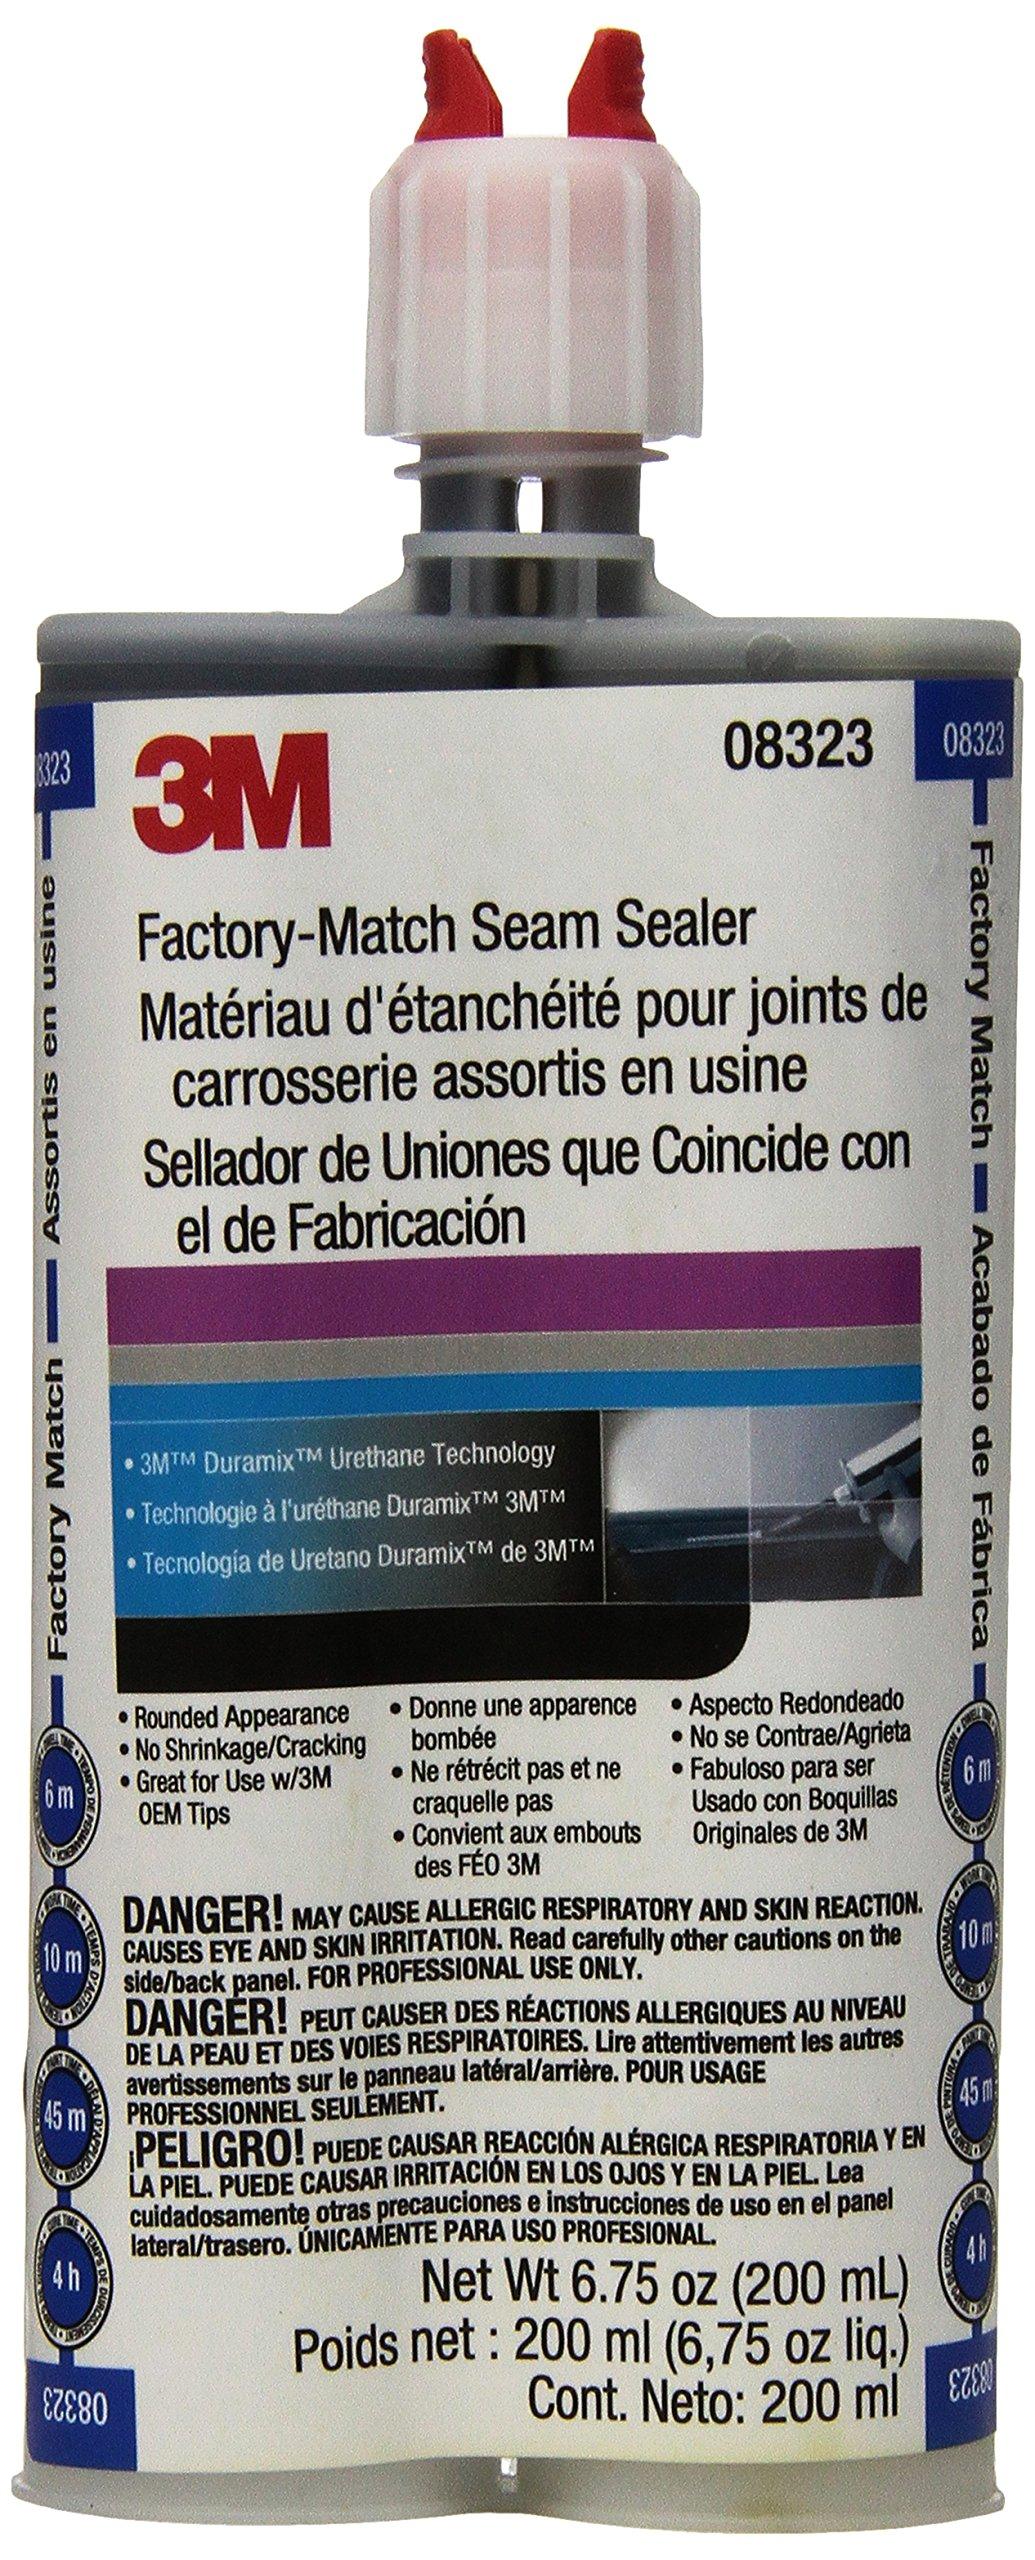 3M 08323 Factory-Match Seam Sealer - 200 ml by 3M